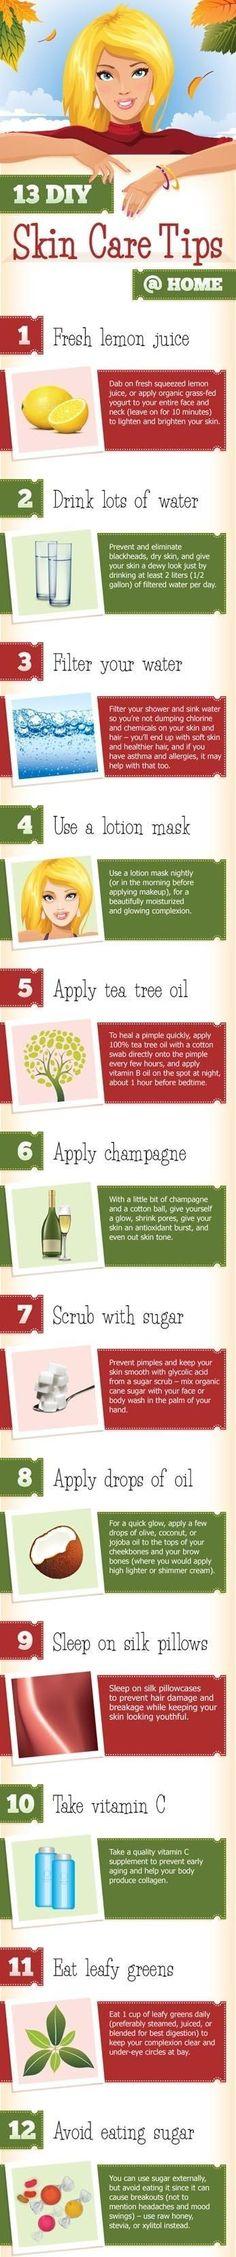 13 Diy Skin Care Tips for You. #SkinCare, $Tips